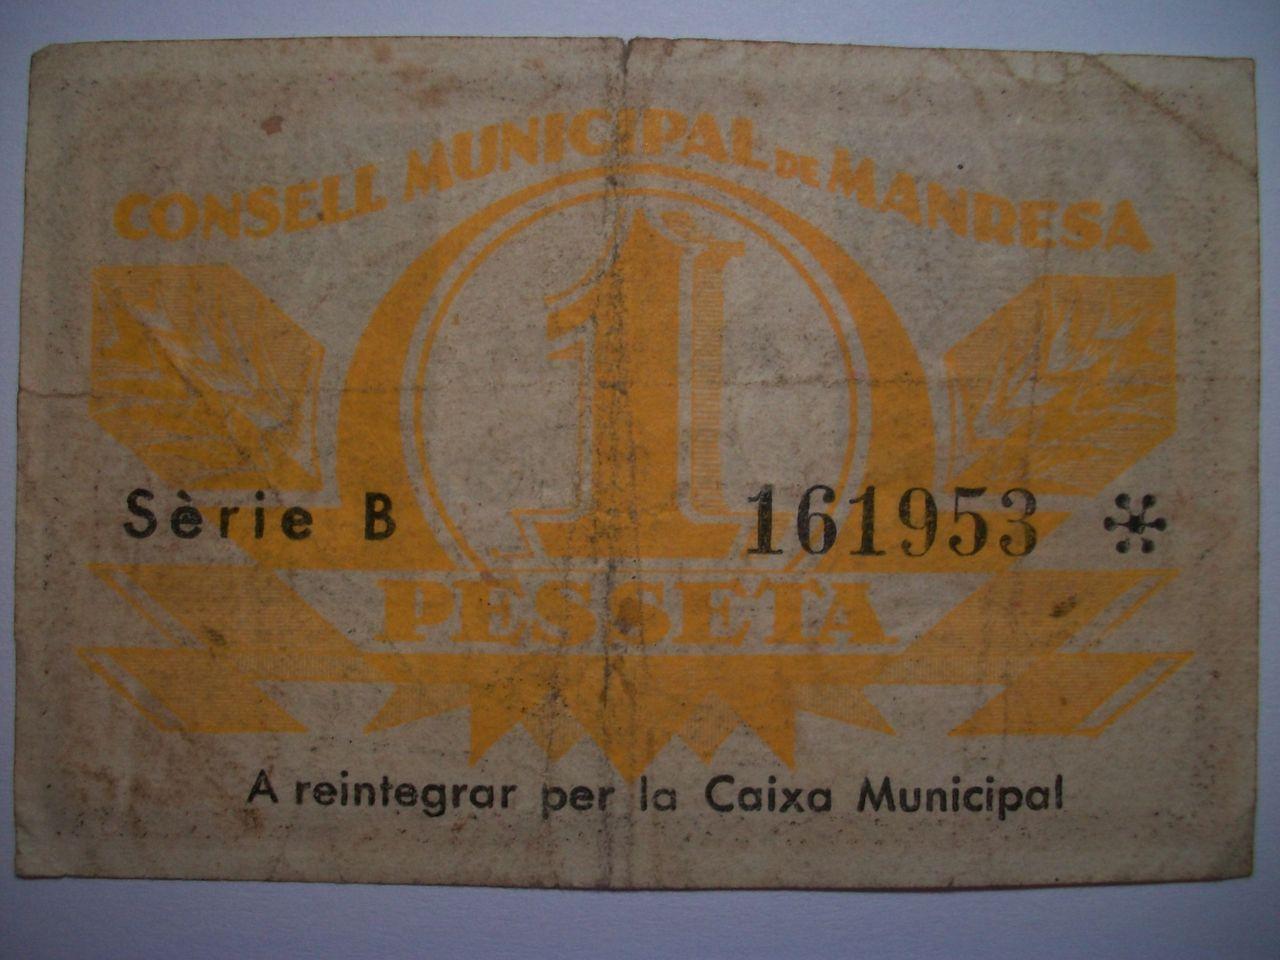 1 Peseta Consell Municipal de Manresa, 1937 100_1919